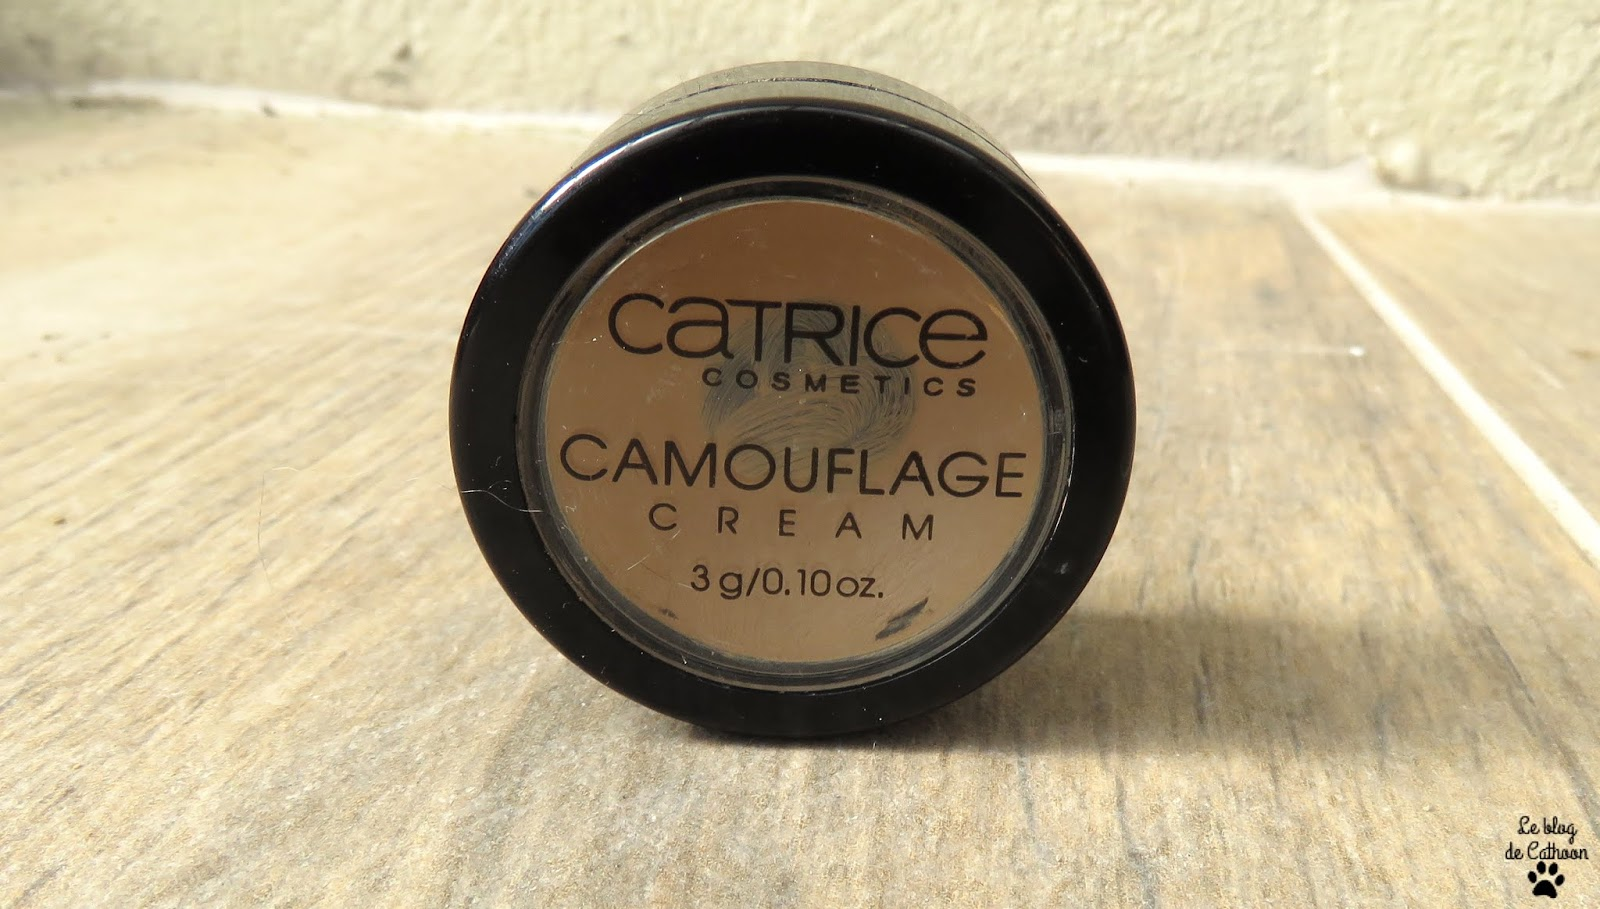 Camouflage Cream - Correcteur 020 Light Beige - Catrice